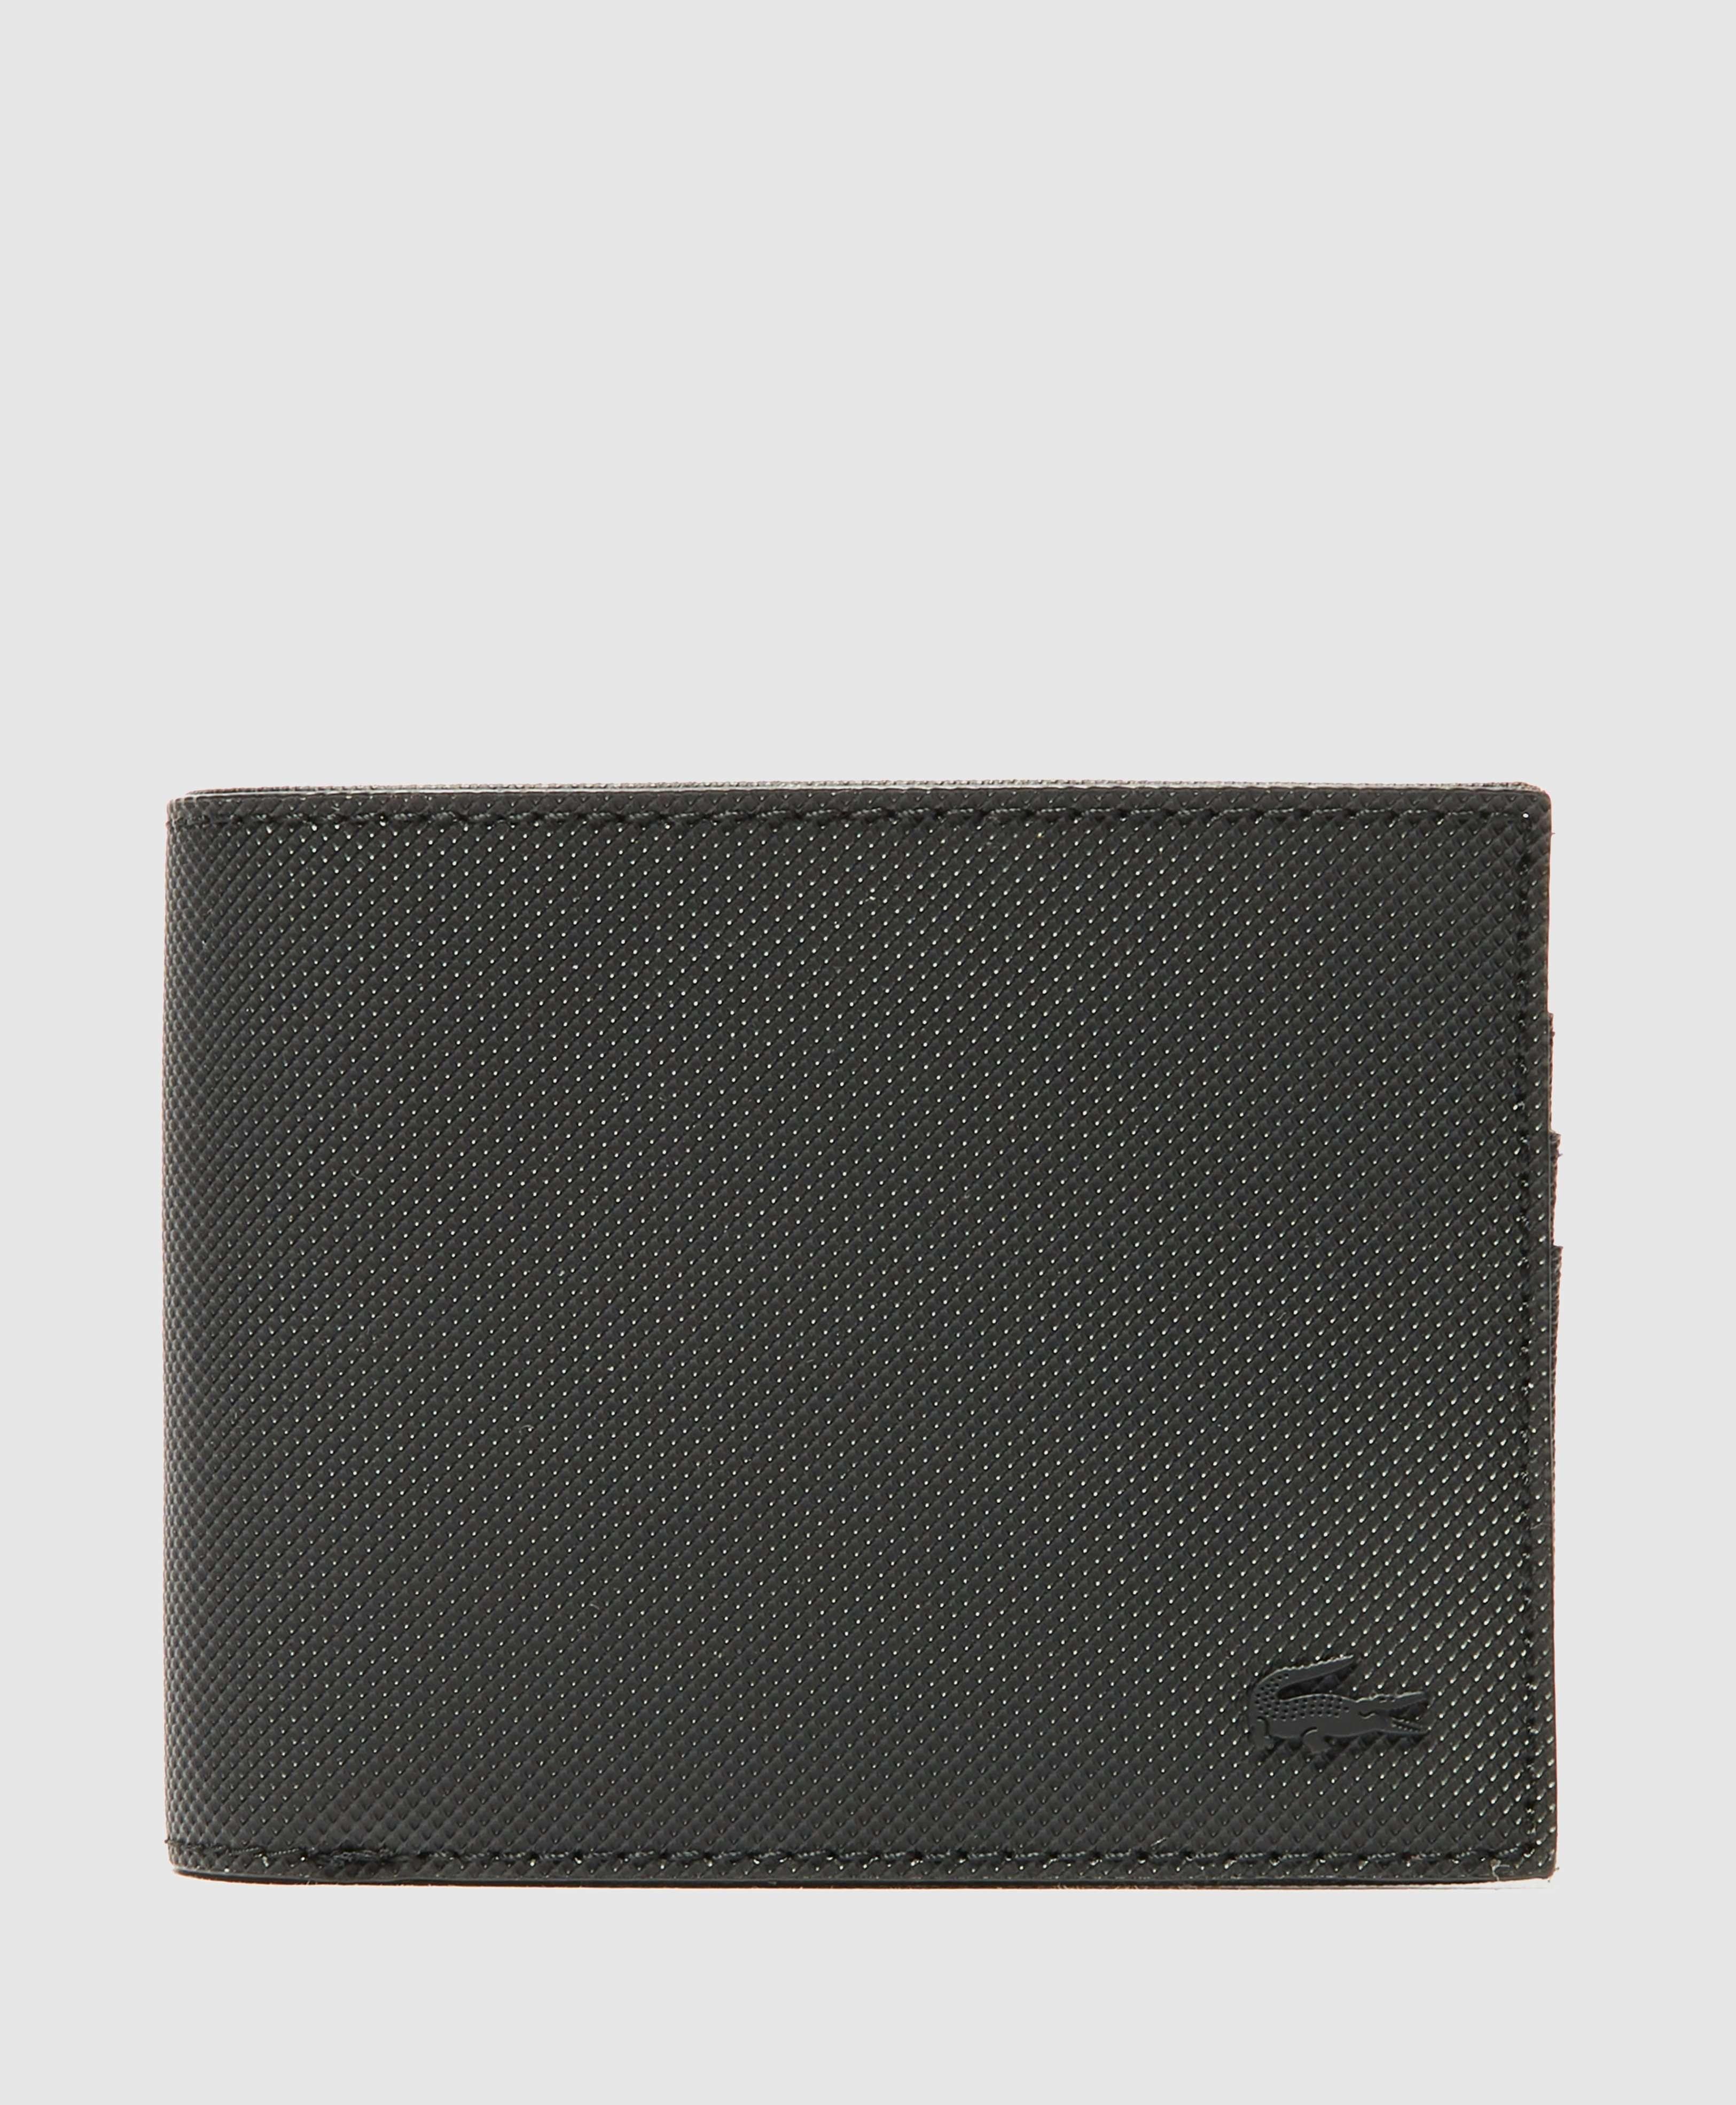 Lacoste Small Croc Wallet